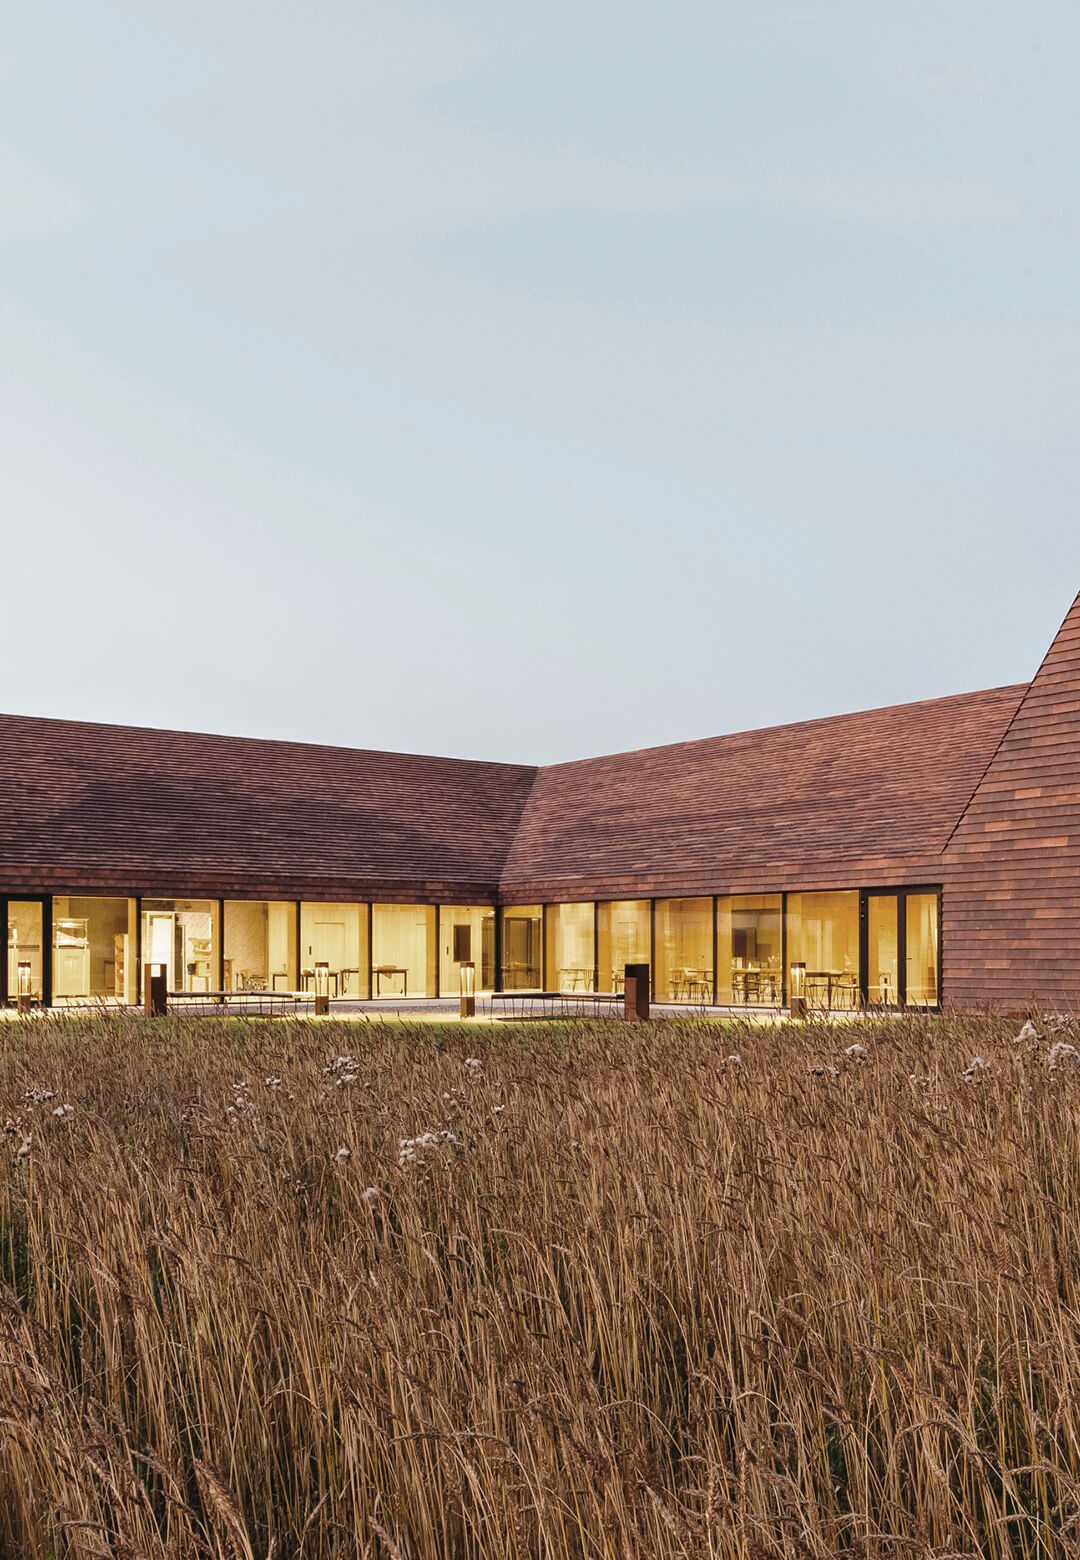 The House of Grain in Denmark by Reiulf Ramstad Arkitekter | House of Grain/ Kornets Hus | Reiulf Ramstad Arkitekter | STIRworld